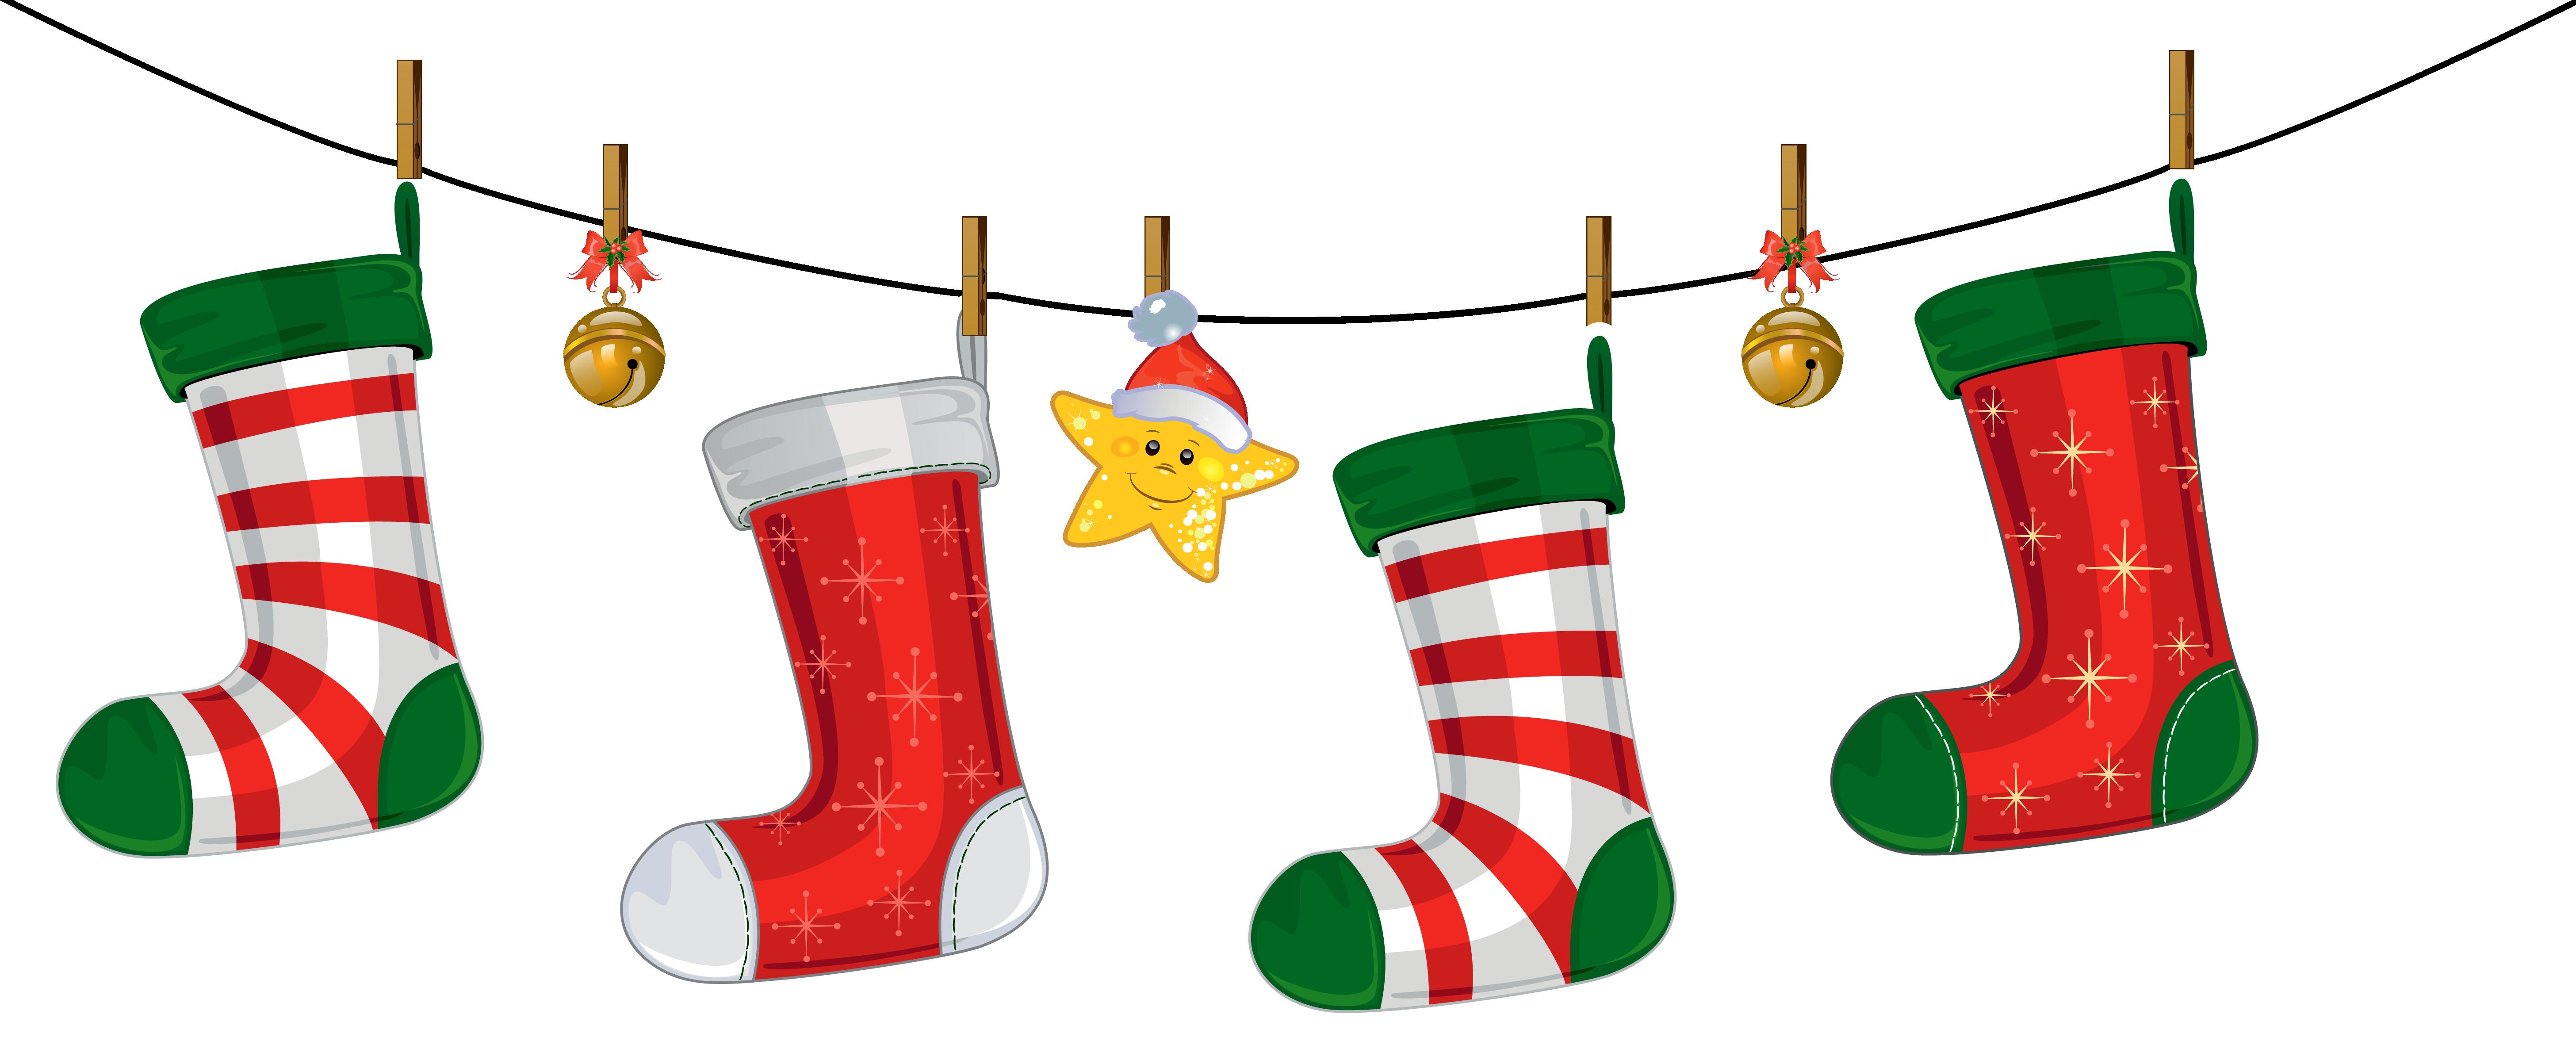 Transparent Christmas Stockings Decoration Png Clipart Japoland